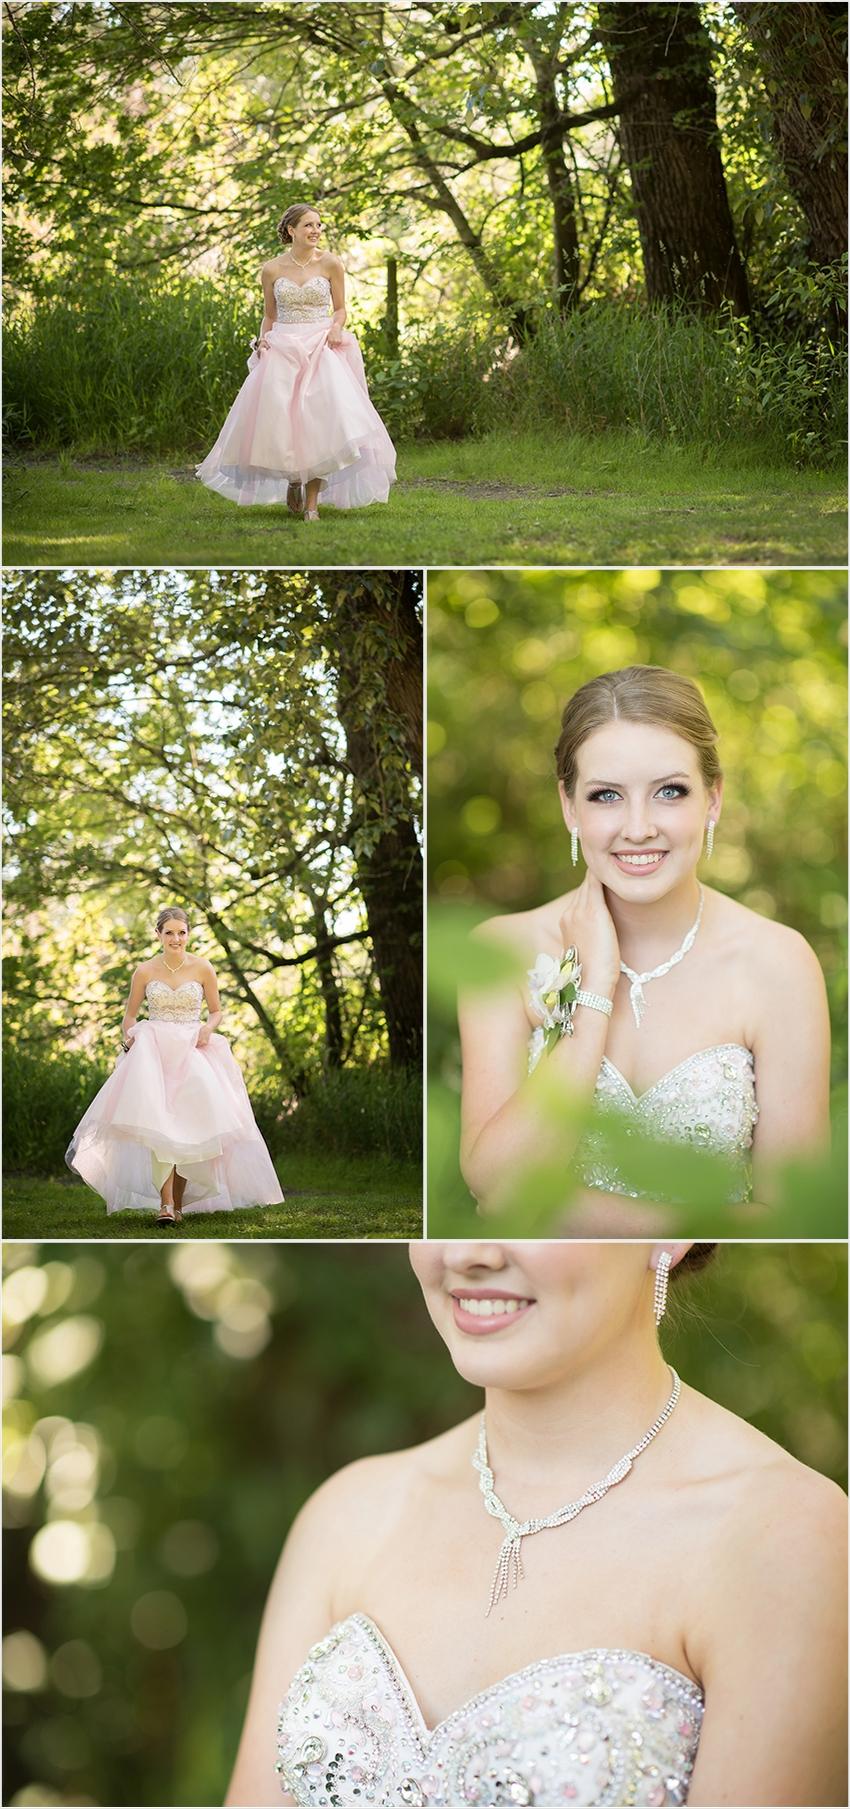 Abbotsford Grad Photographer Prom 2016 003 (Side 3)